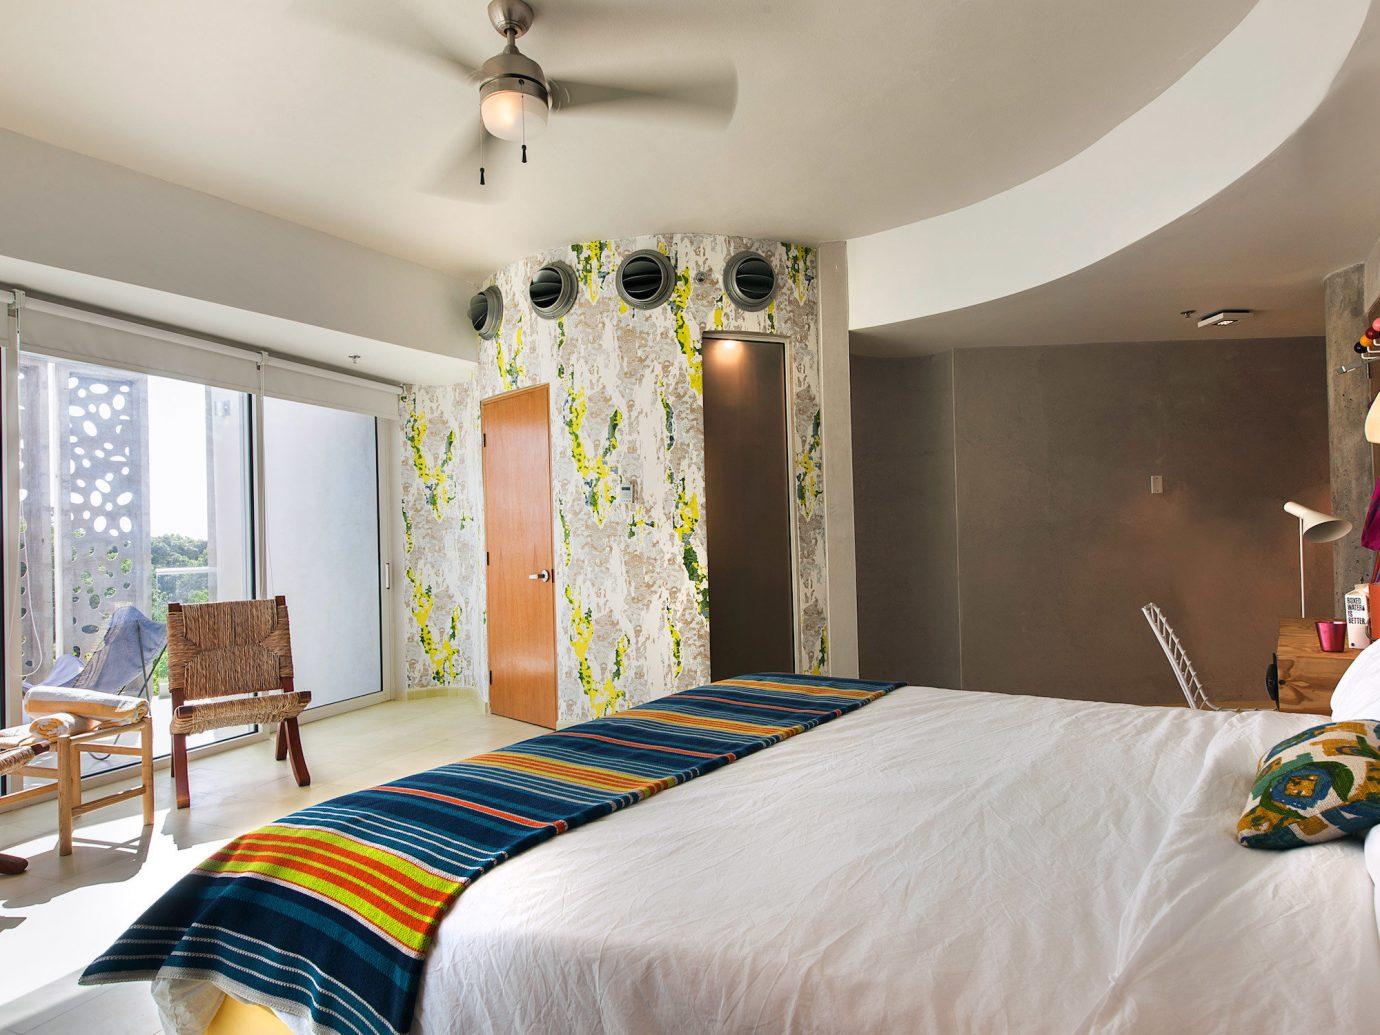 Boutique Design Hip Modern Trip Ideas indoor wall bed ceiling room Bedroom property scene estate Suite interior design hotel real estate cottage bed sheet furniture decorated